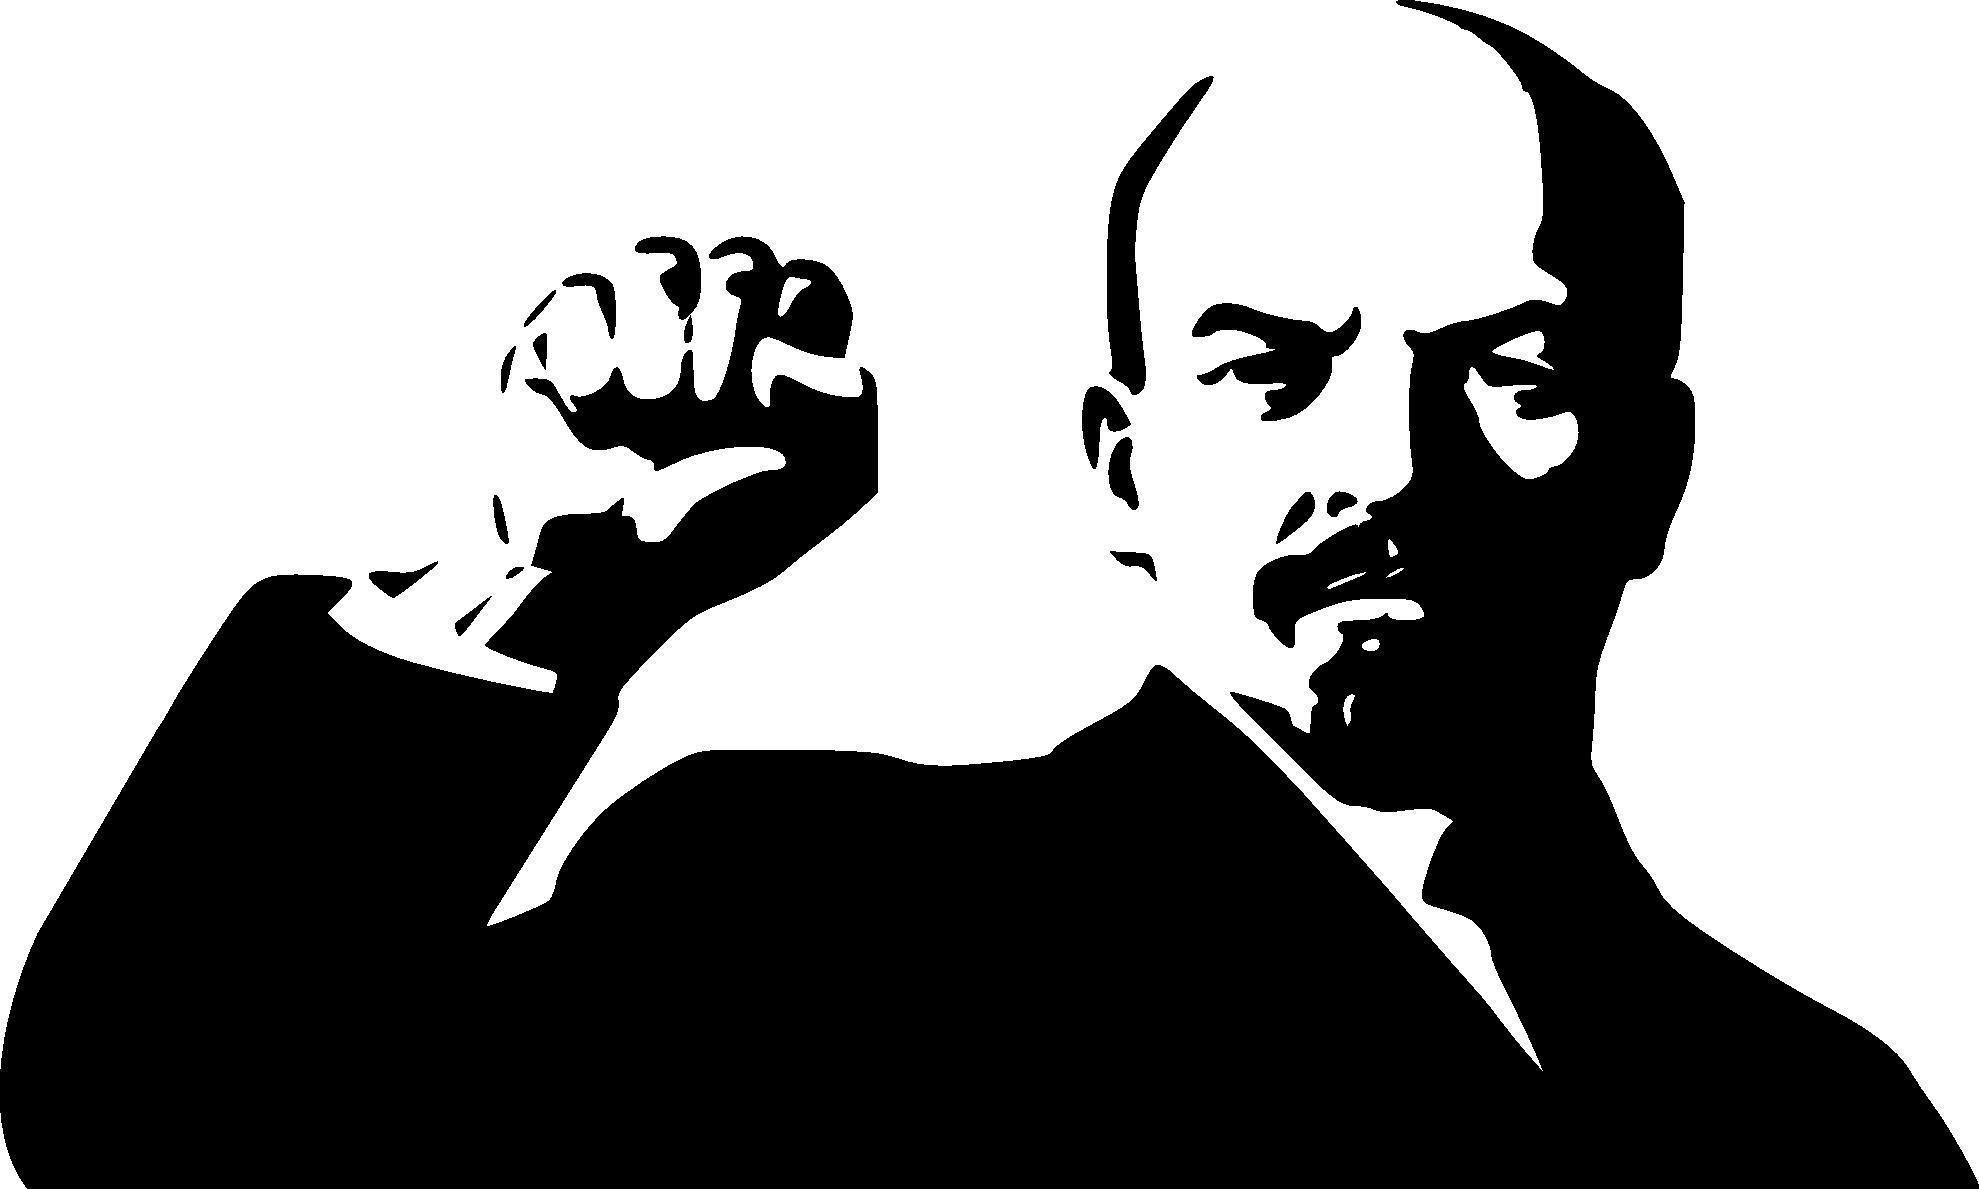 lenin_fist-1979px